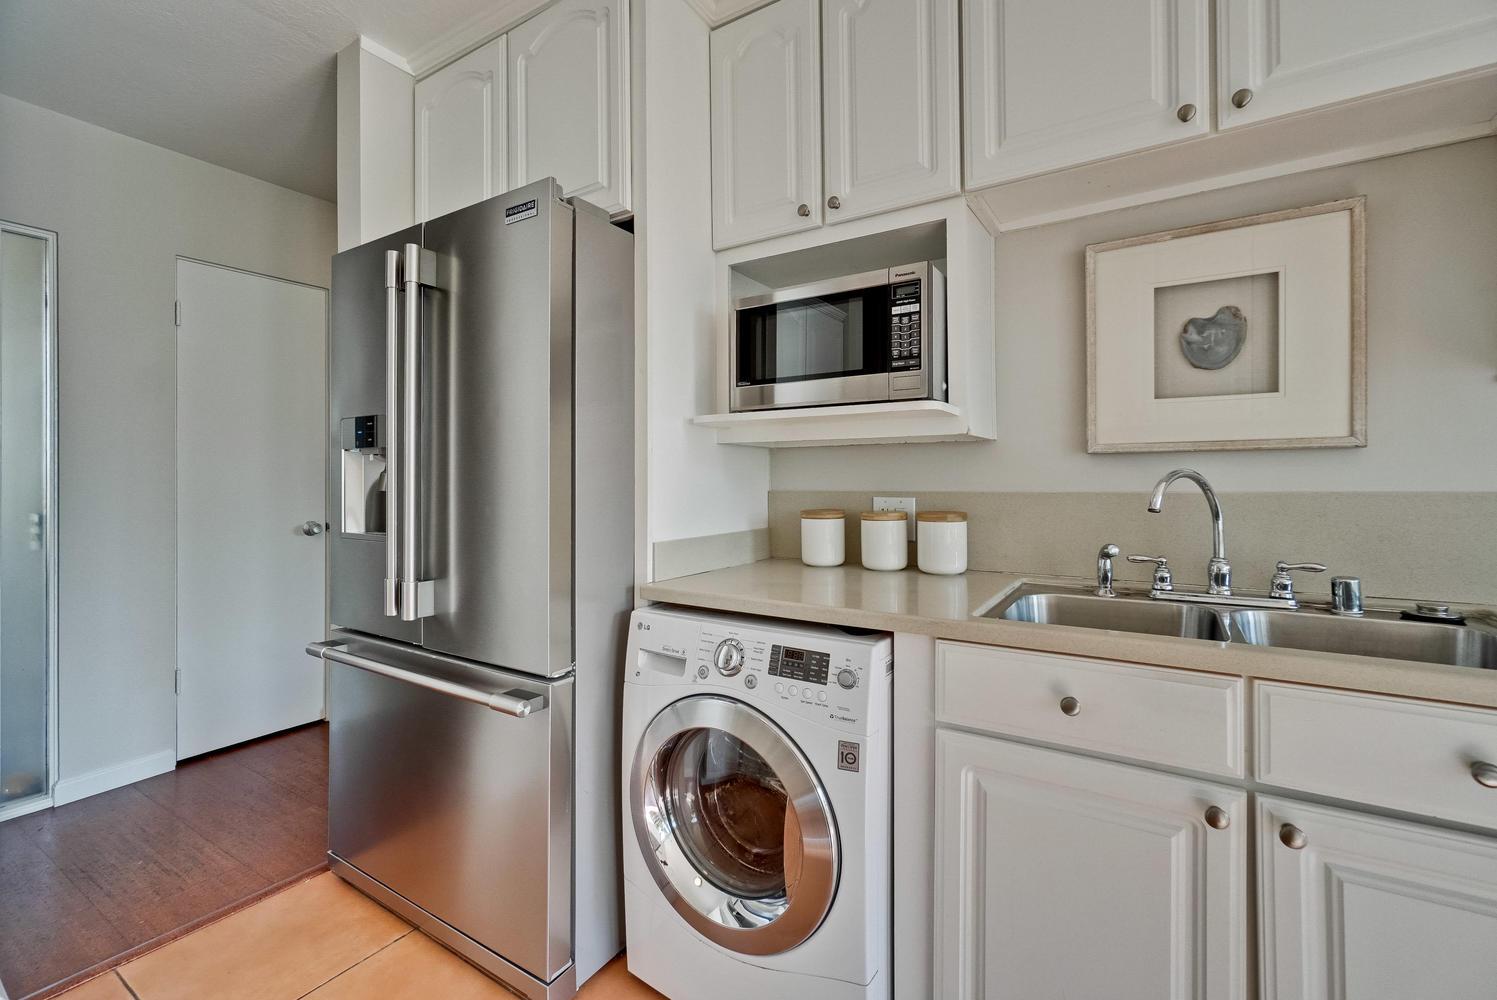 9 Laundry Room.jpg